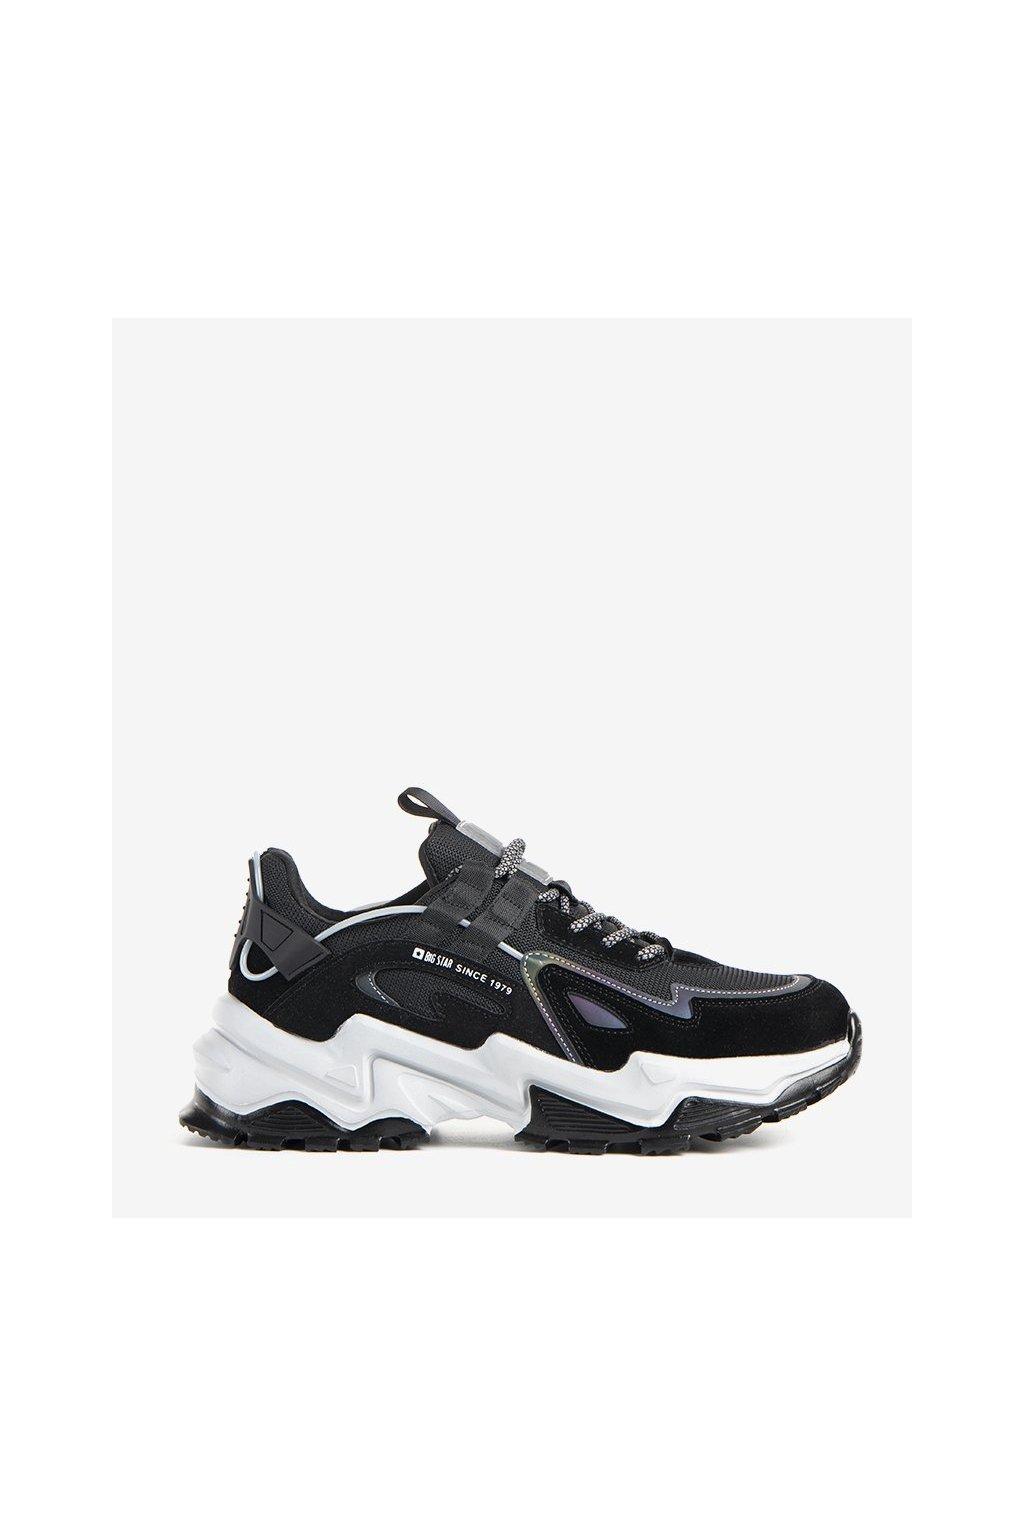 Dámske topánky BS čierne kód II174044 BL - GM